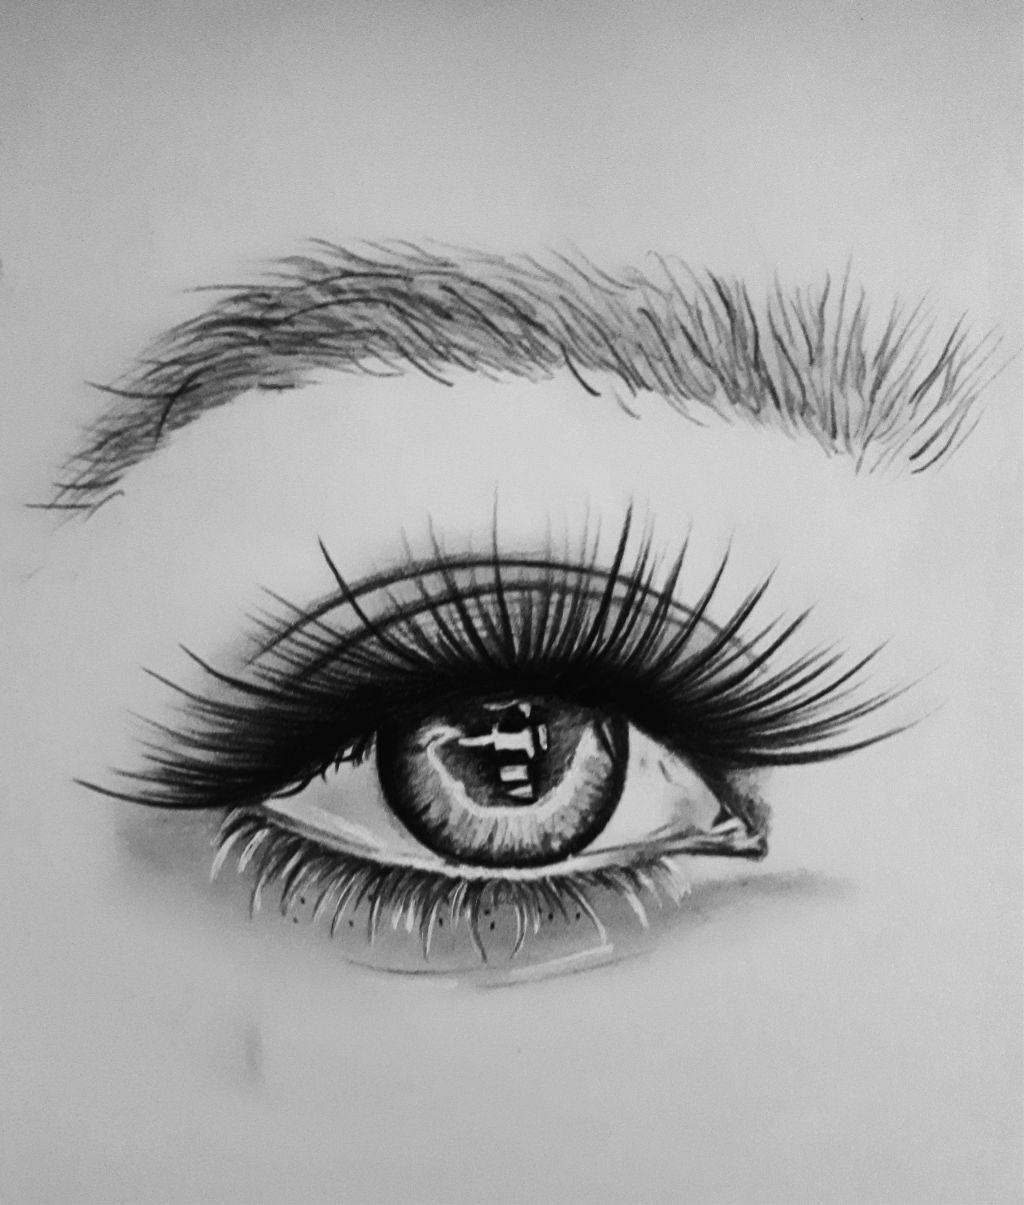 Freetoedit artmyartdrawing mydrawingpencil art eyes